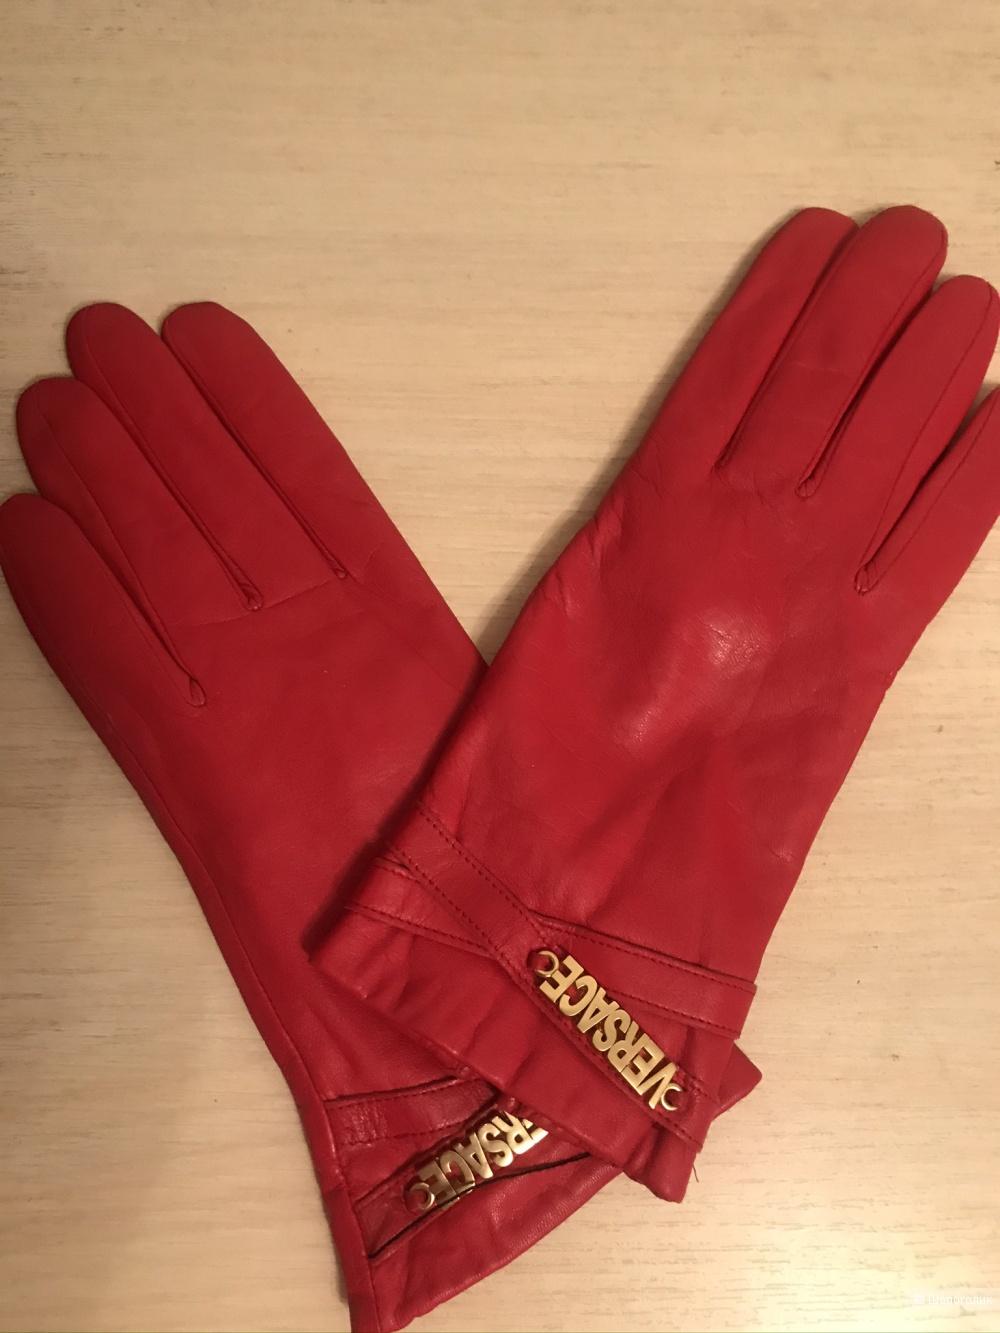 Перчатки фирма Versace размер 7.5